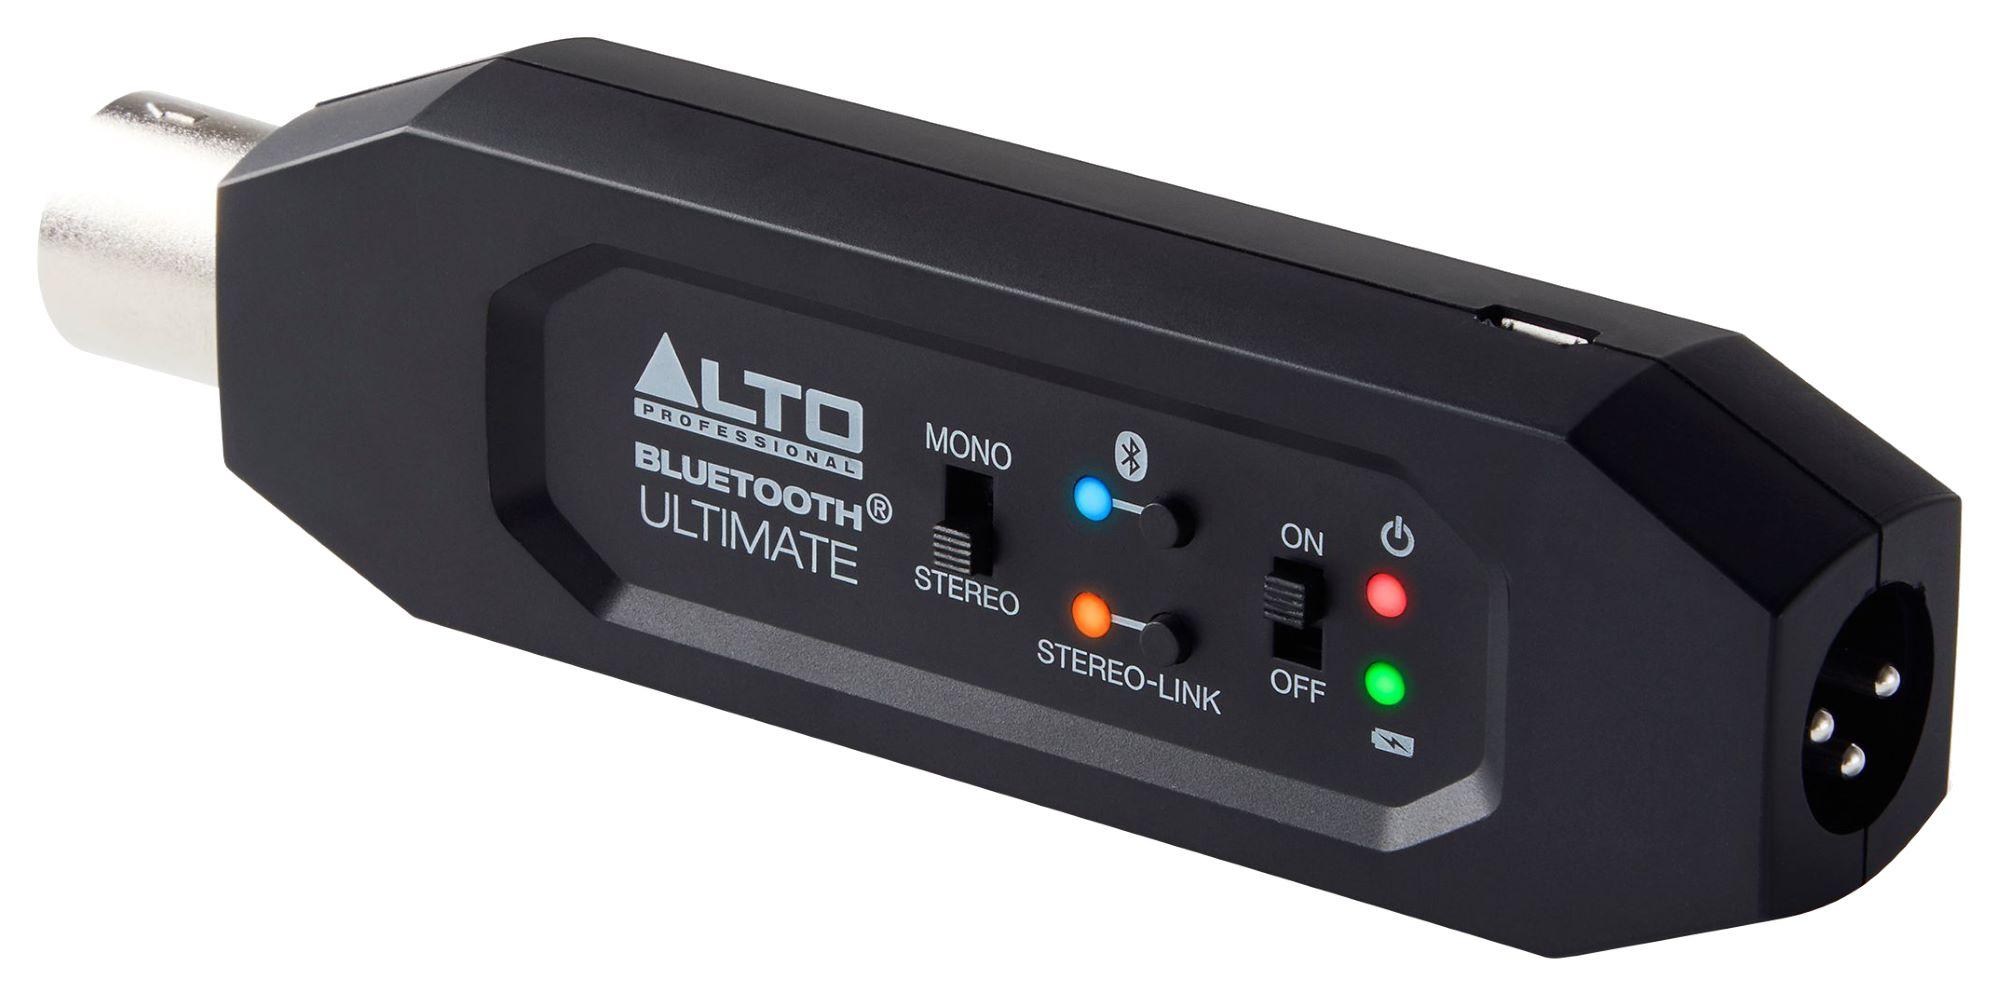 Drahtlossysteme - Alto Bluetooth Ultimate - Onlineshop Musikhaus Kirstein